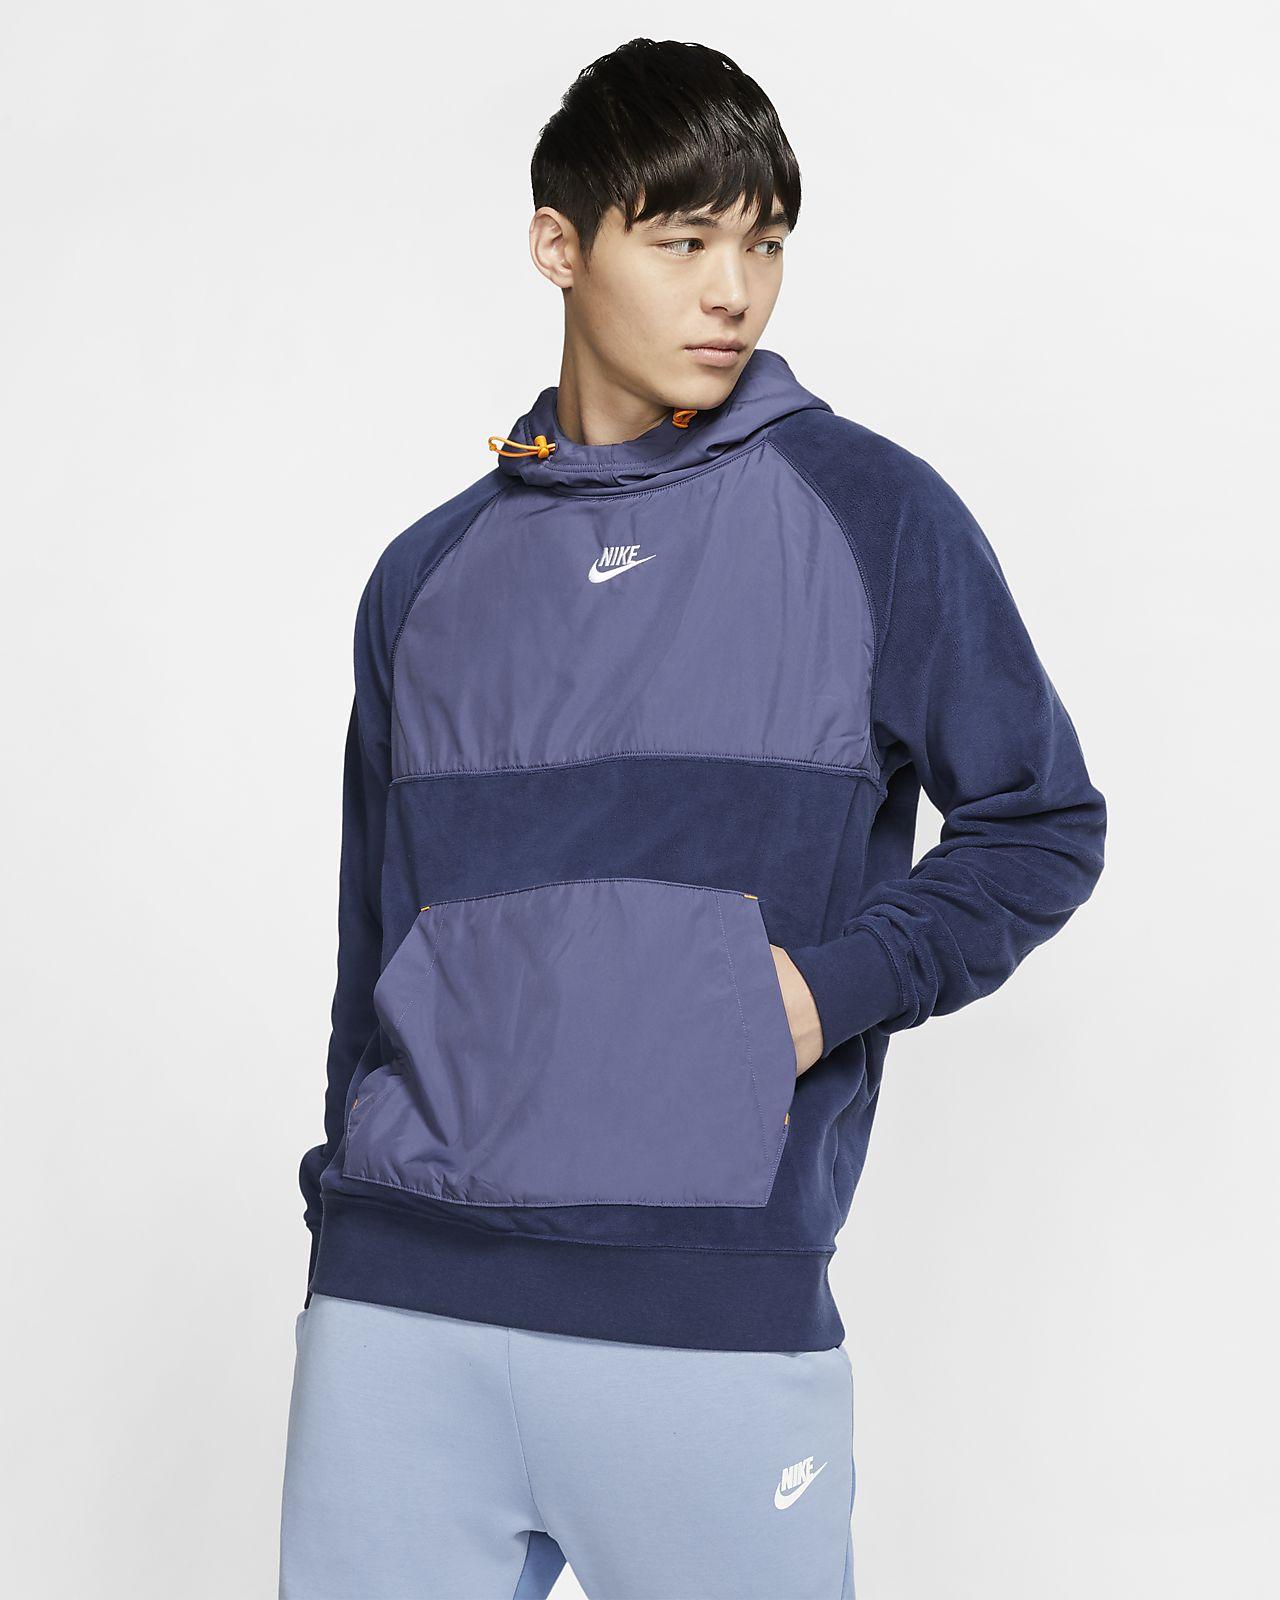 Nike Sportswear Sudadera con capucha